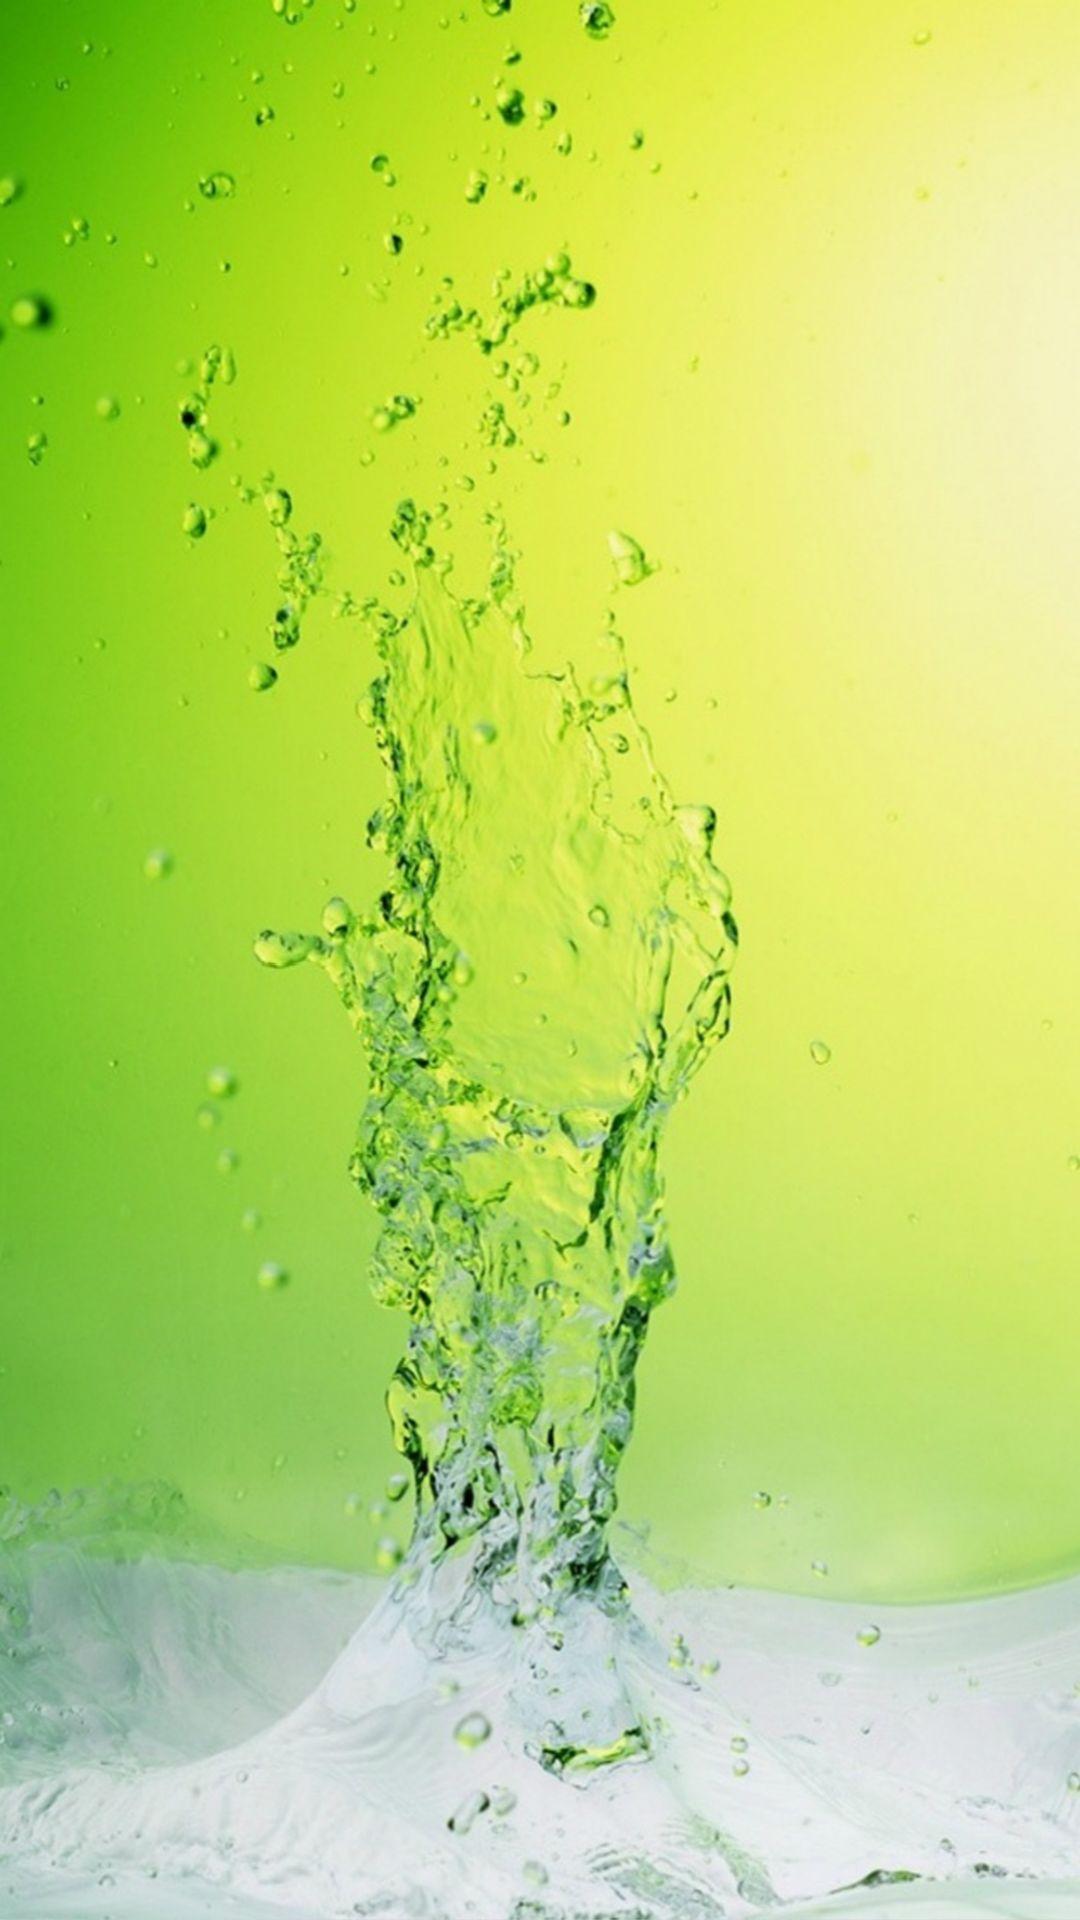 Water Splash HD desktop wallpaper High Definition Fullscreen